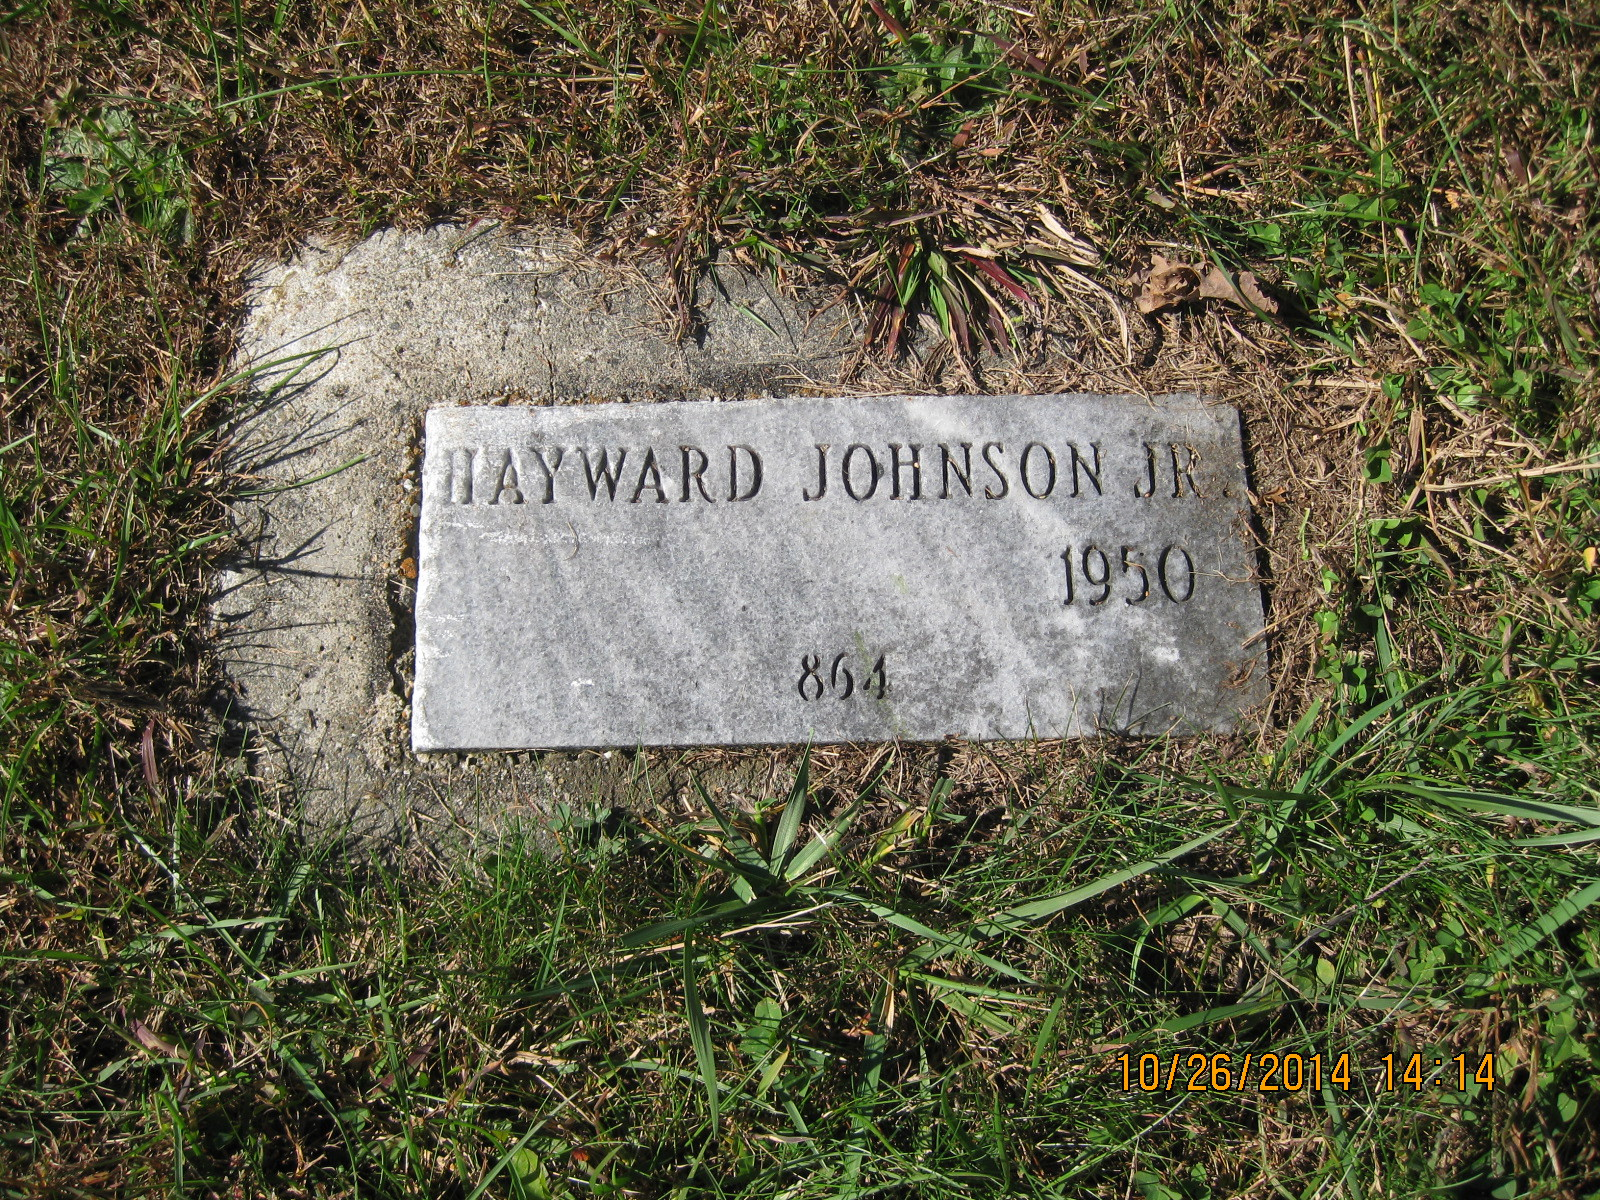 Hayward A Jr Johnson